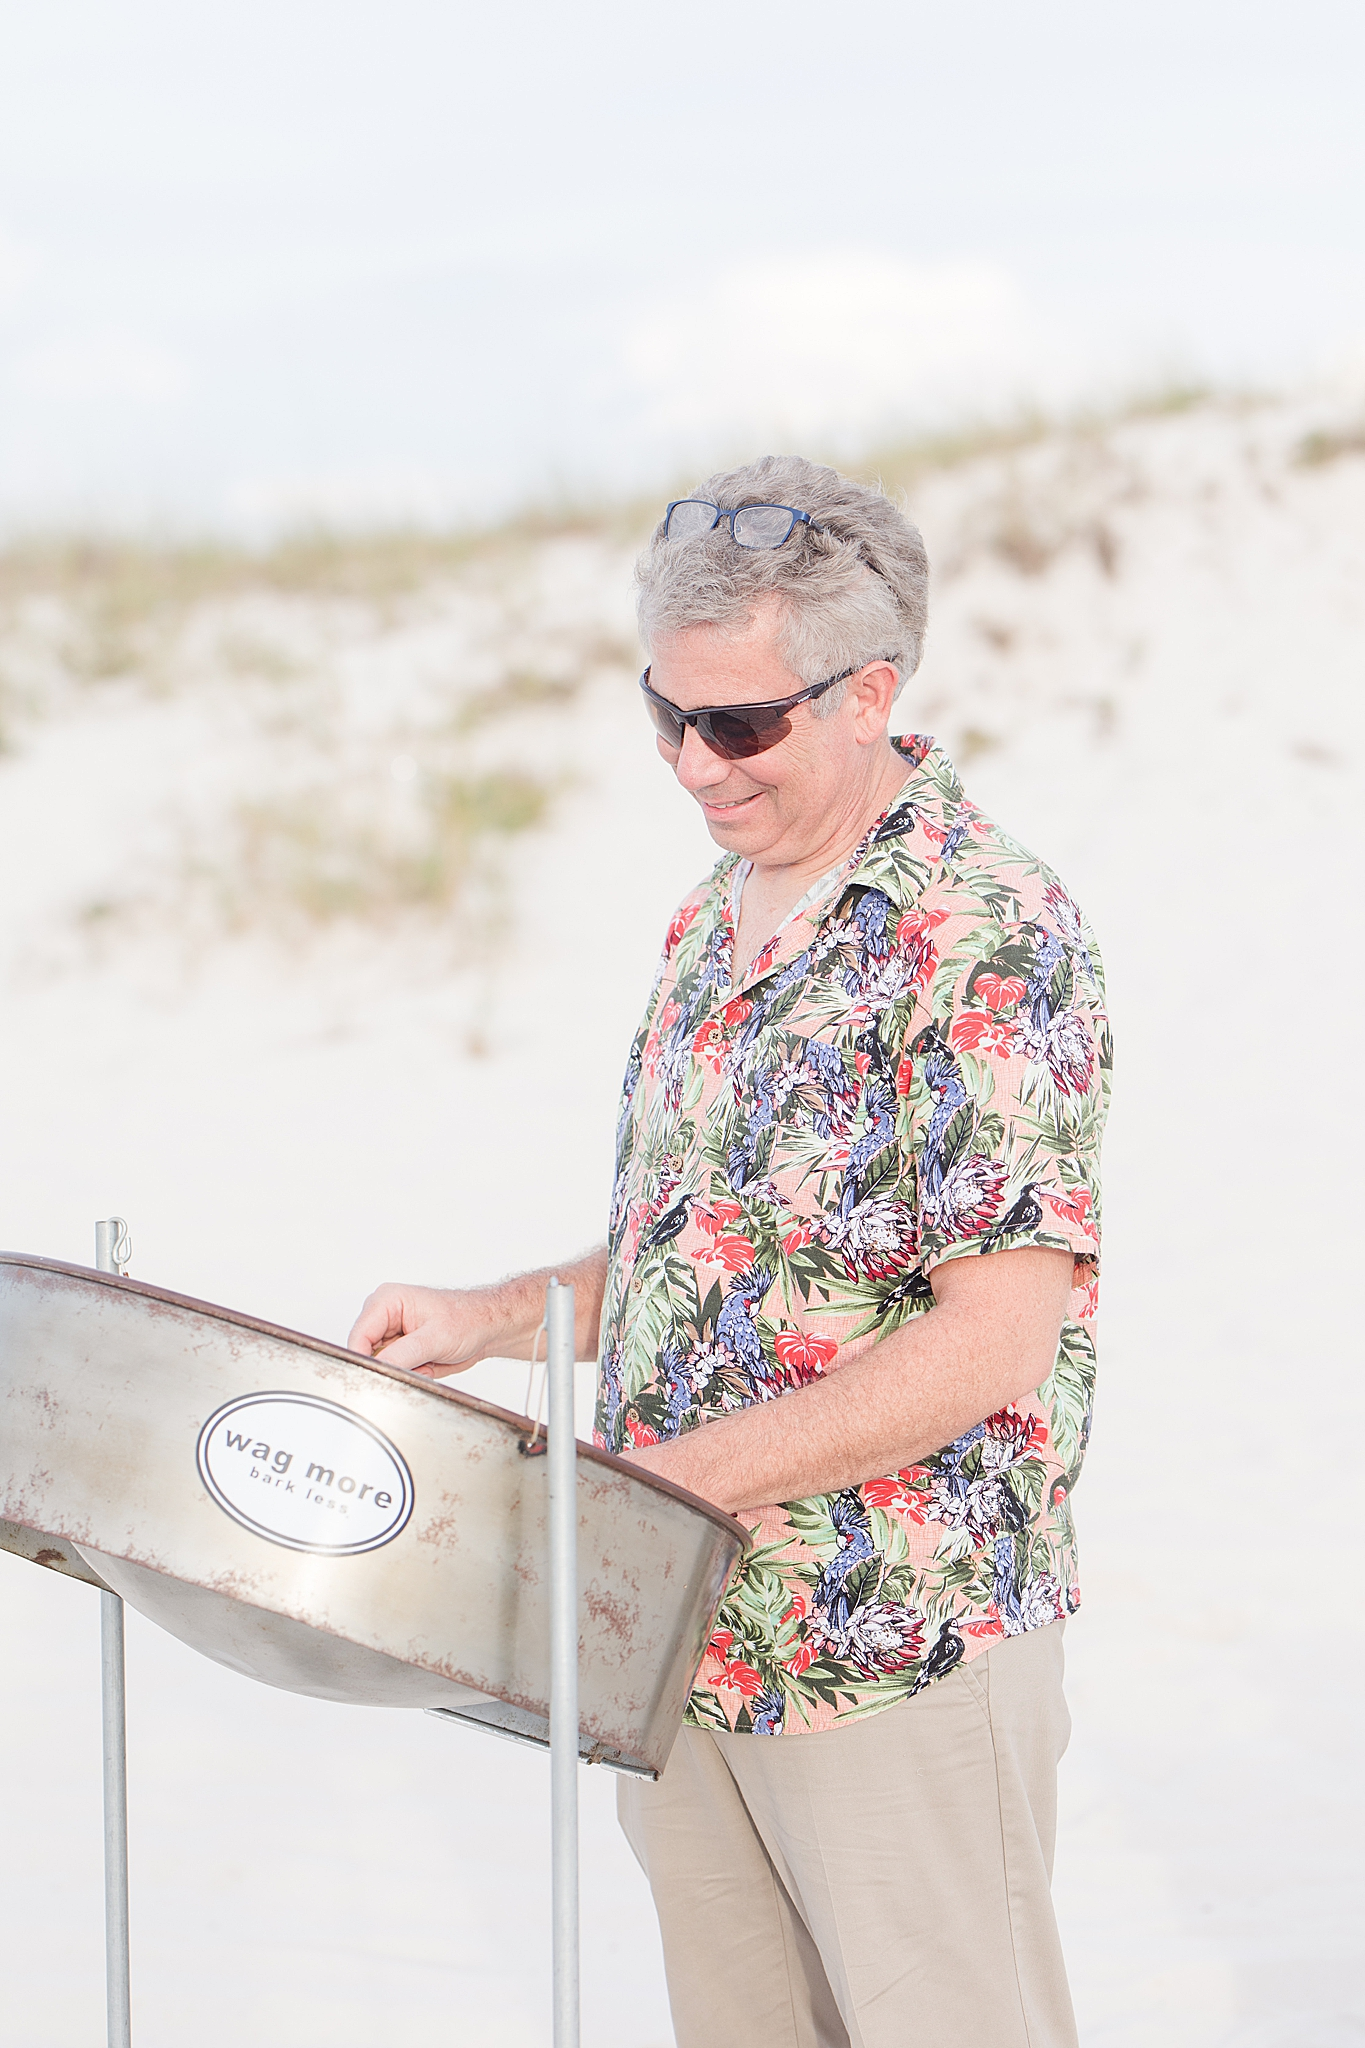 Alabama musician plays steel drums before beach wedding